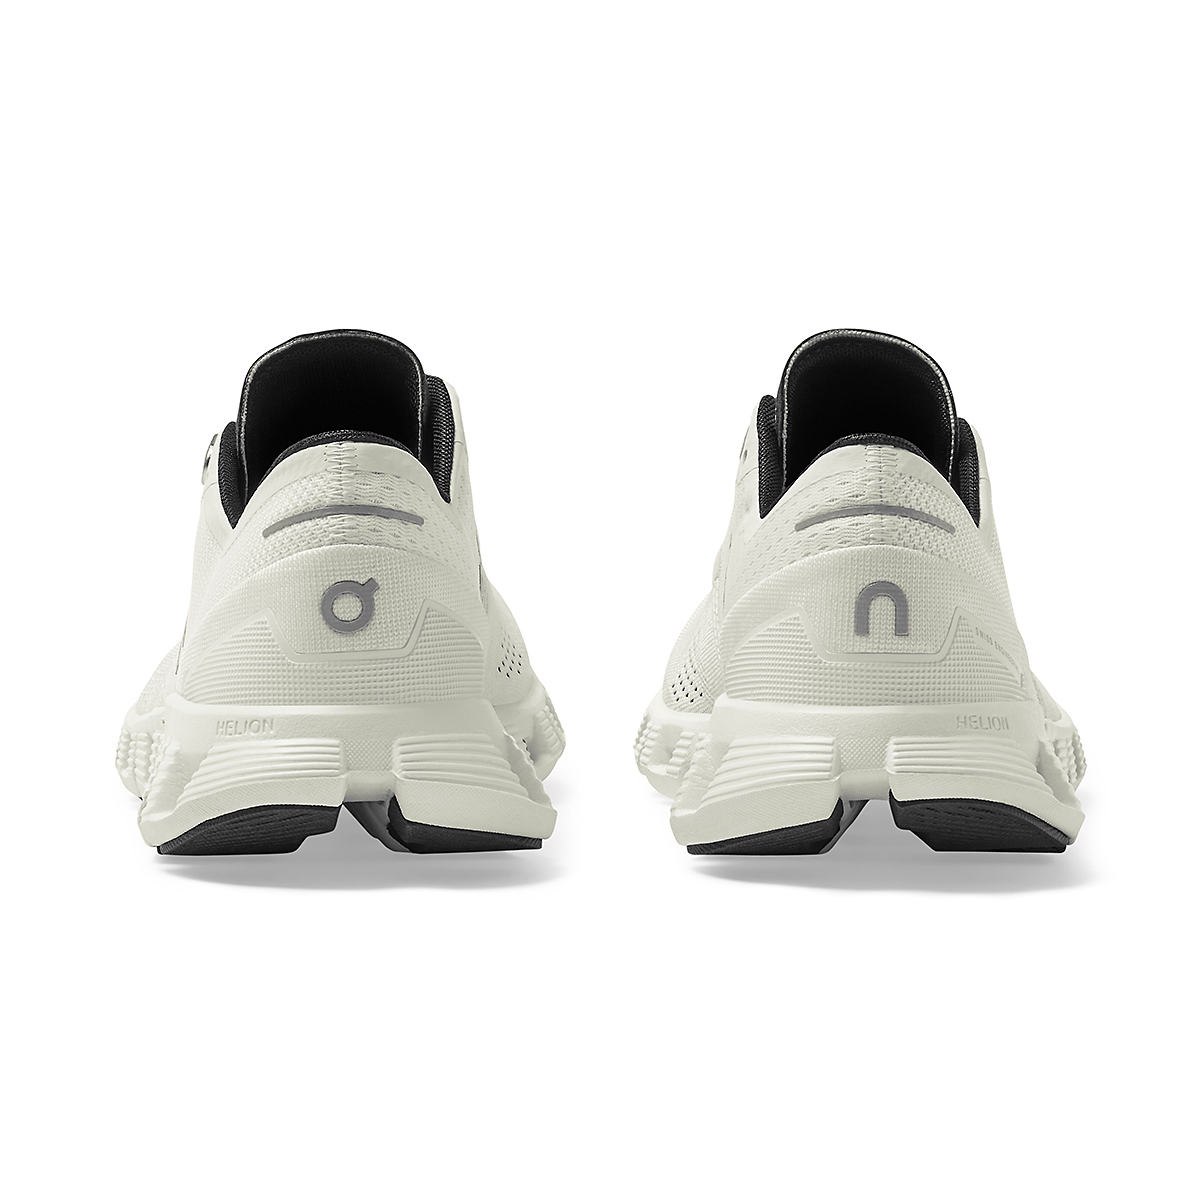 Women's On Cloud X 2.0 Running Shoe - Color: White/Black - Size: 5 - Width: Regular, White/Black, large, image 5